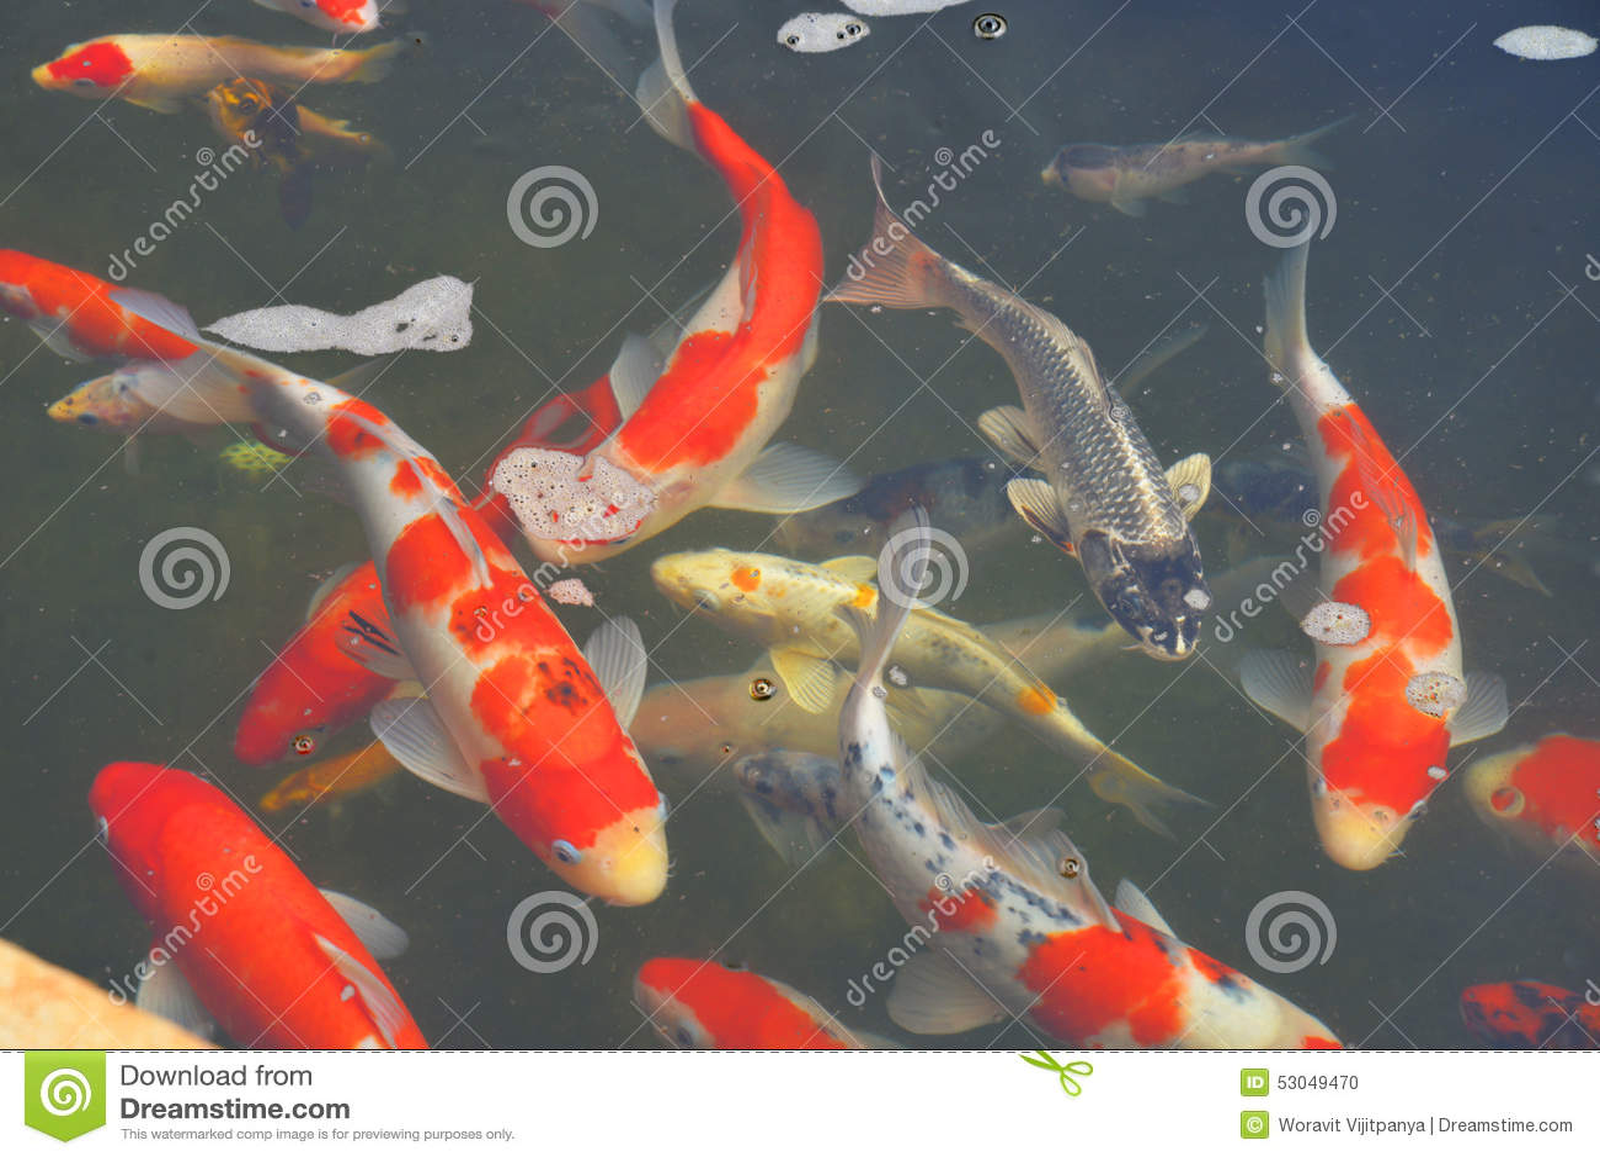 Koi pond in pond stock photo image 53049470 for Beautiful koi fish